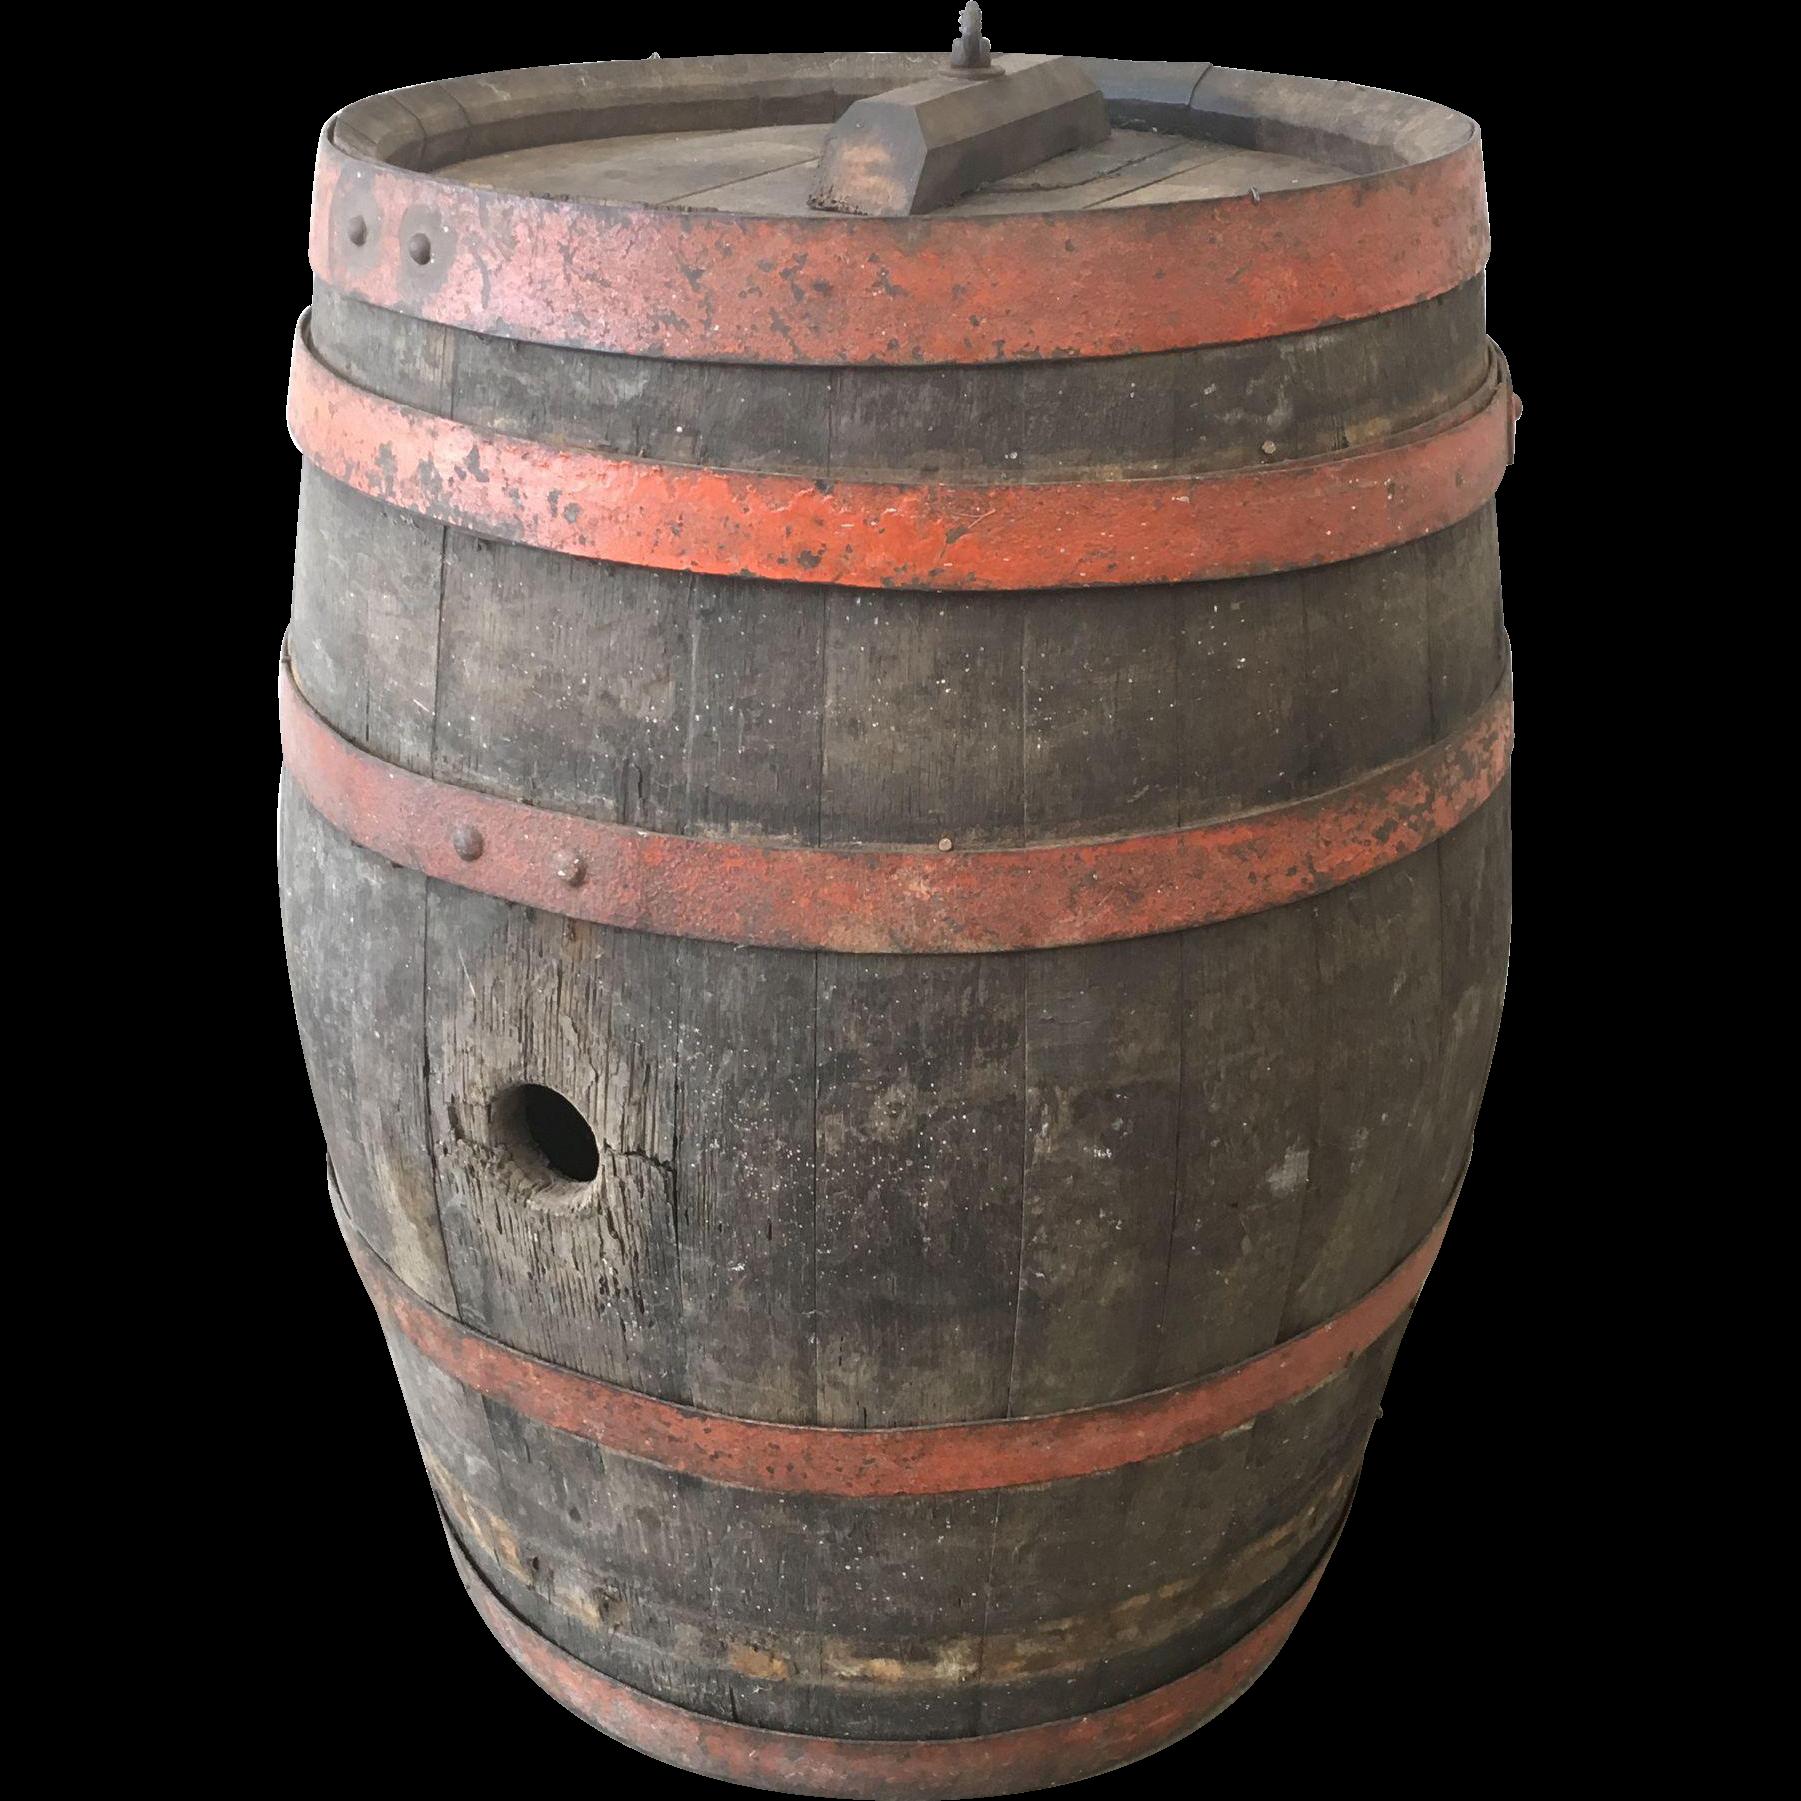 French Antique Wine Barrel Vineyard Decor